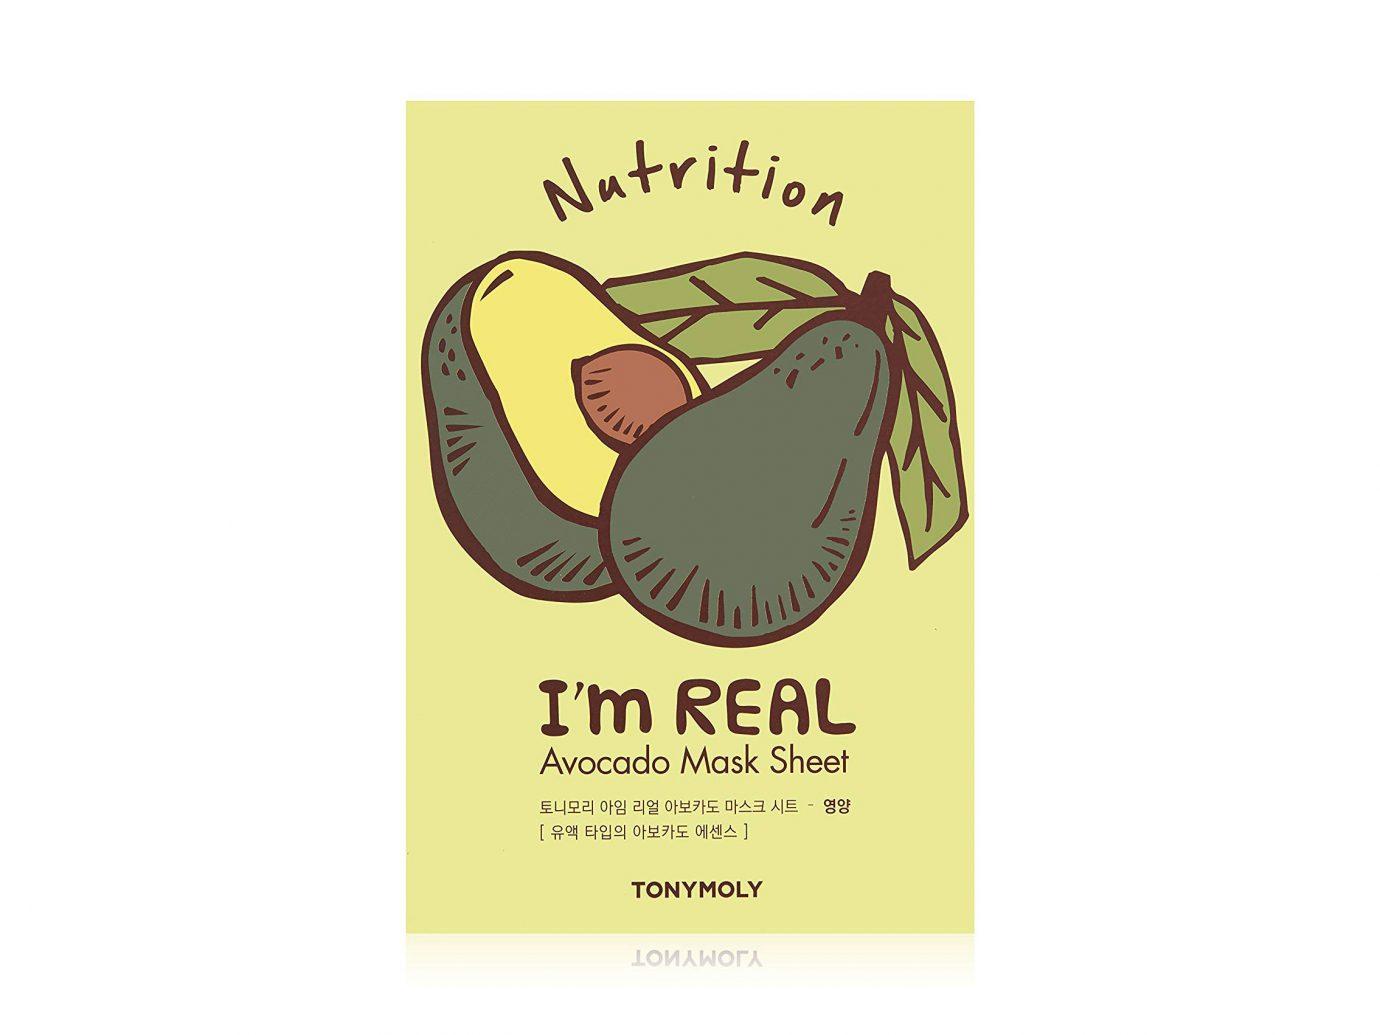 TONYMOLY I'm Real Avocado Mask Sheet 10-Pack